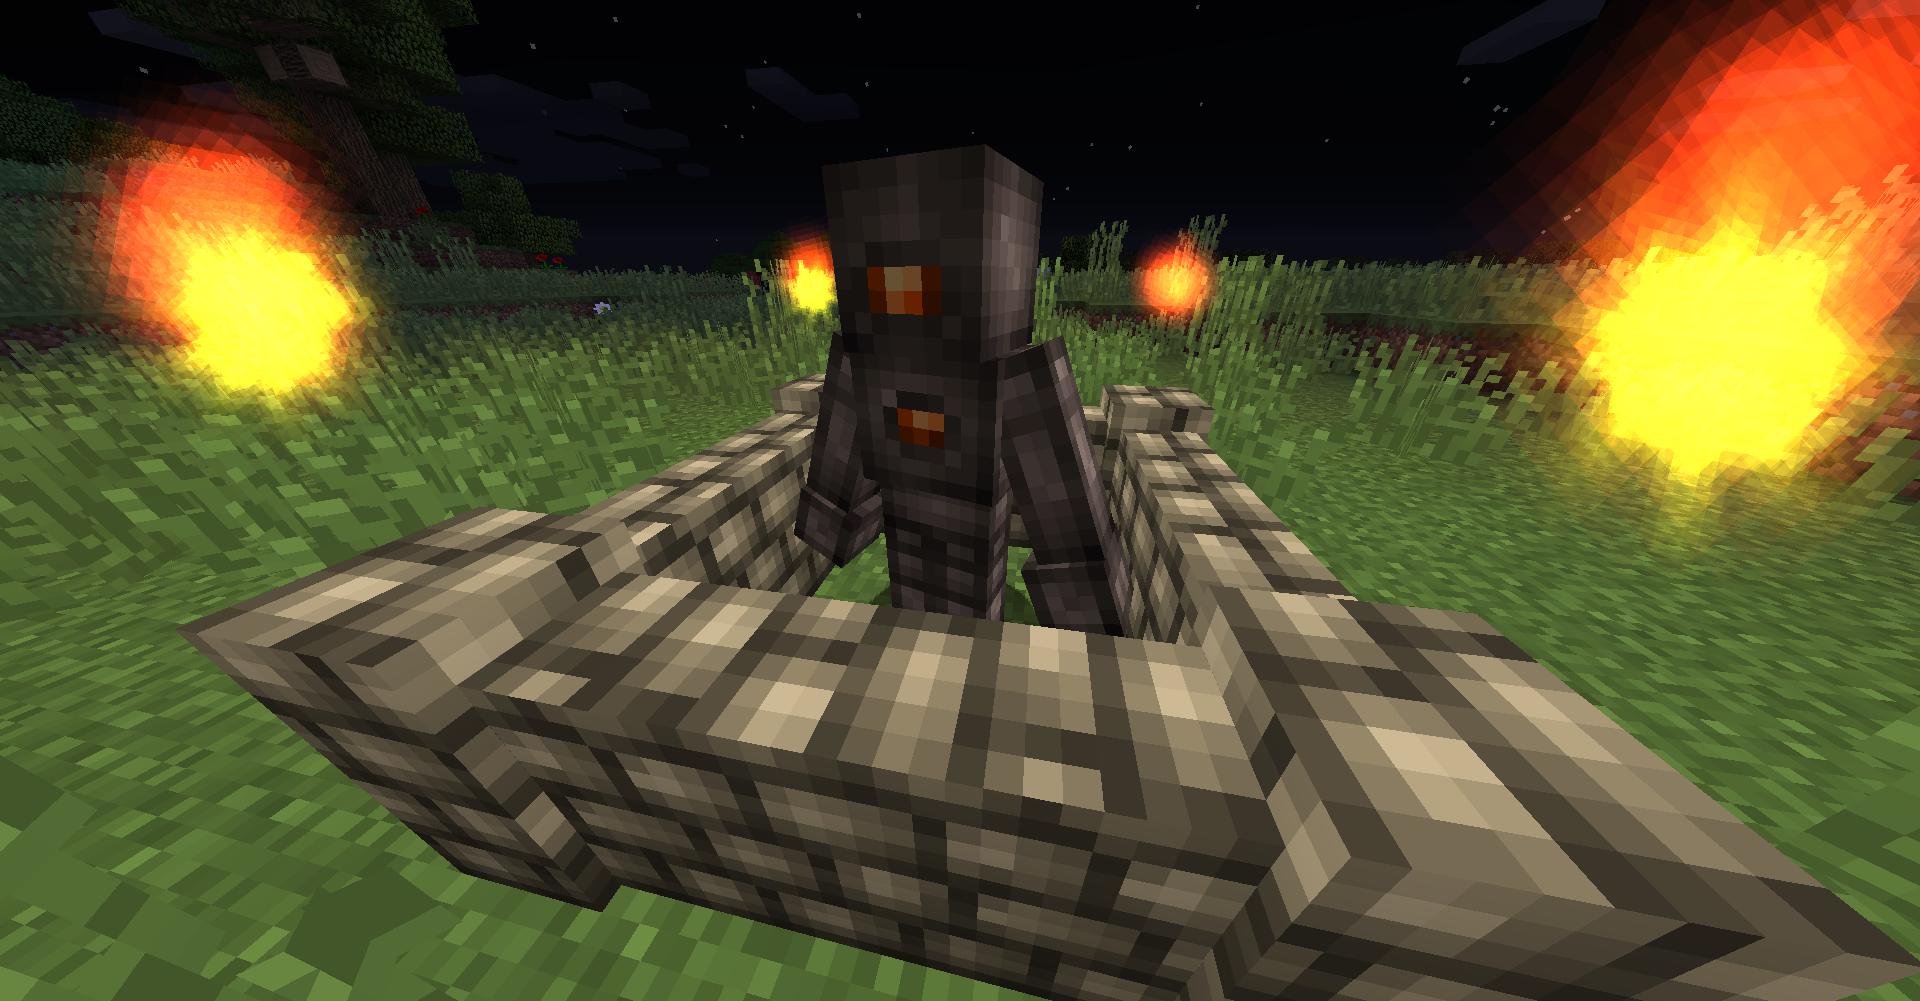 1 10 2] Embers Mod Download | Minecraft Forum